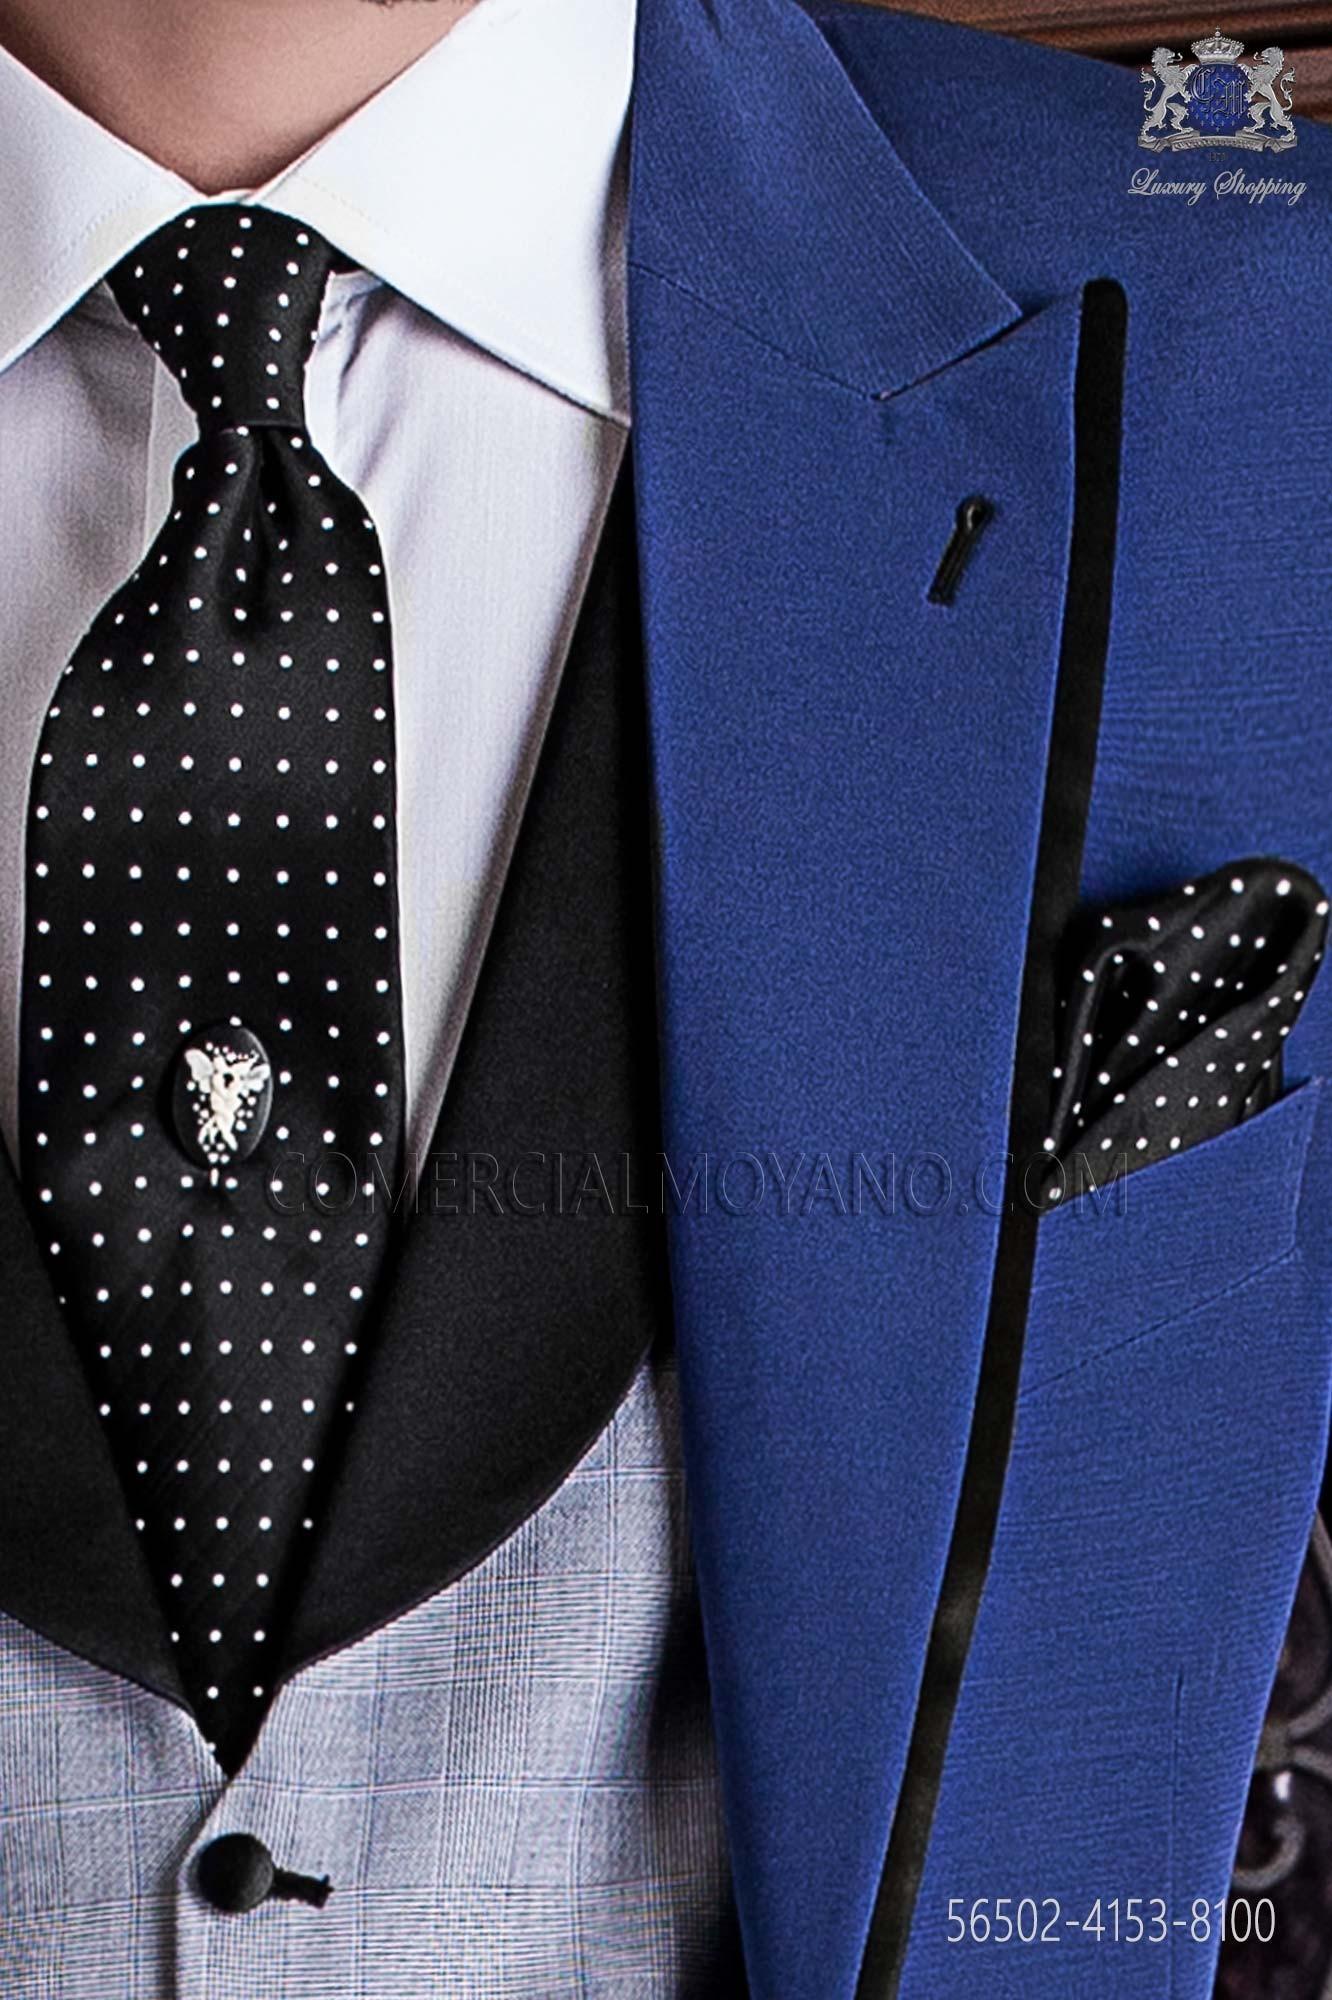 6e6784034d09 Black Polka Dot Tie And Handkerchief - Image Of Tie